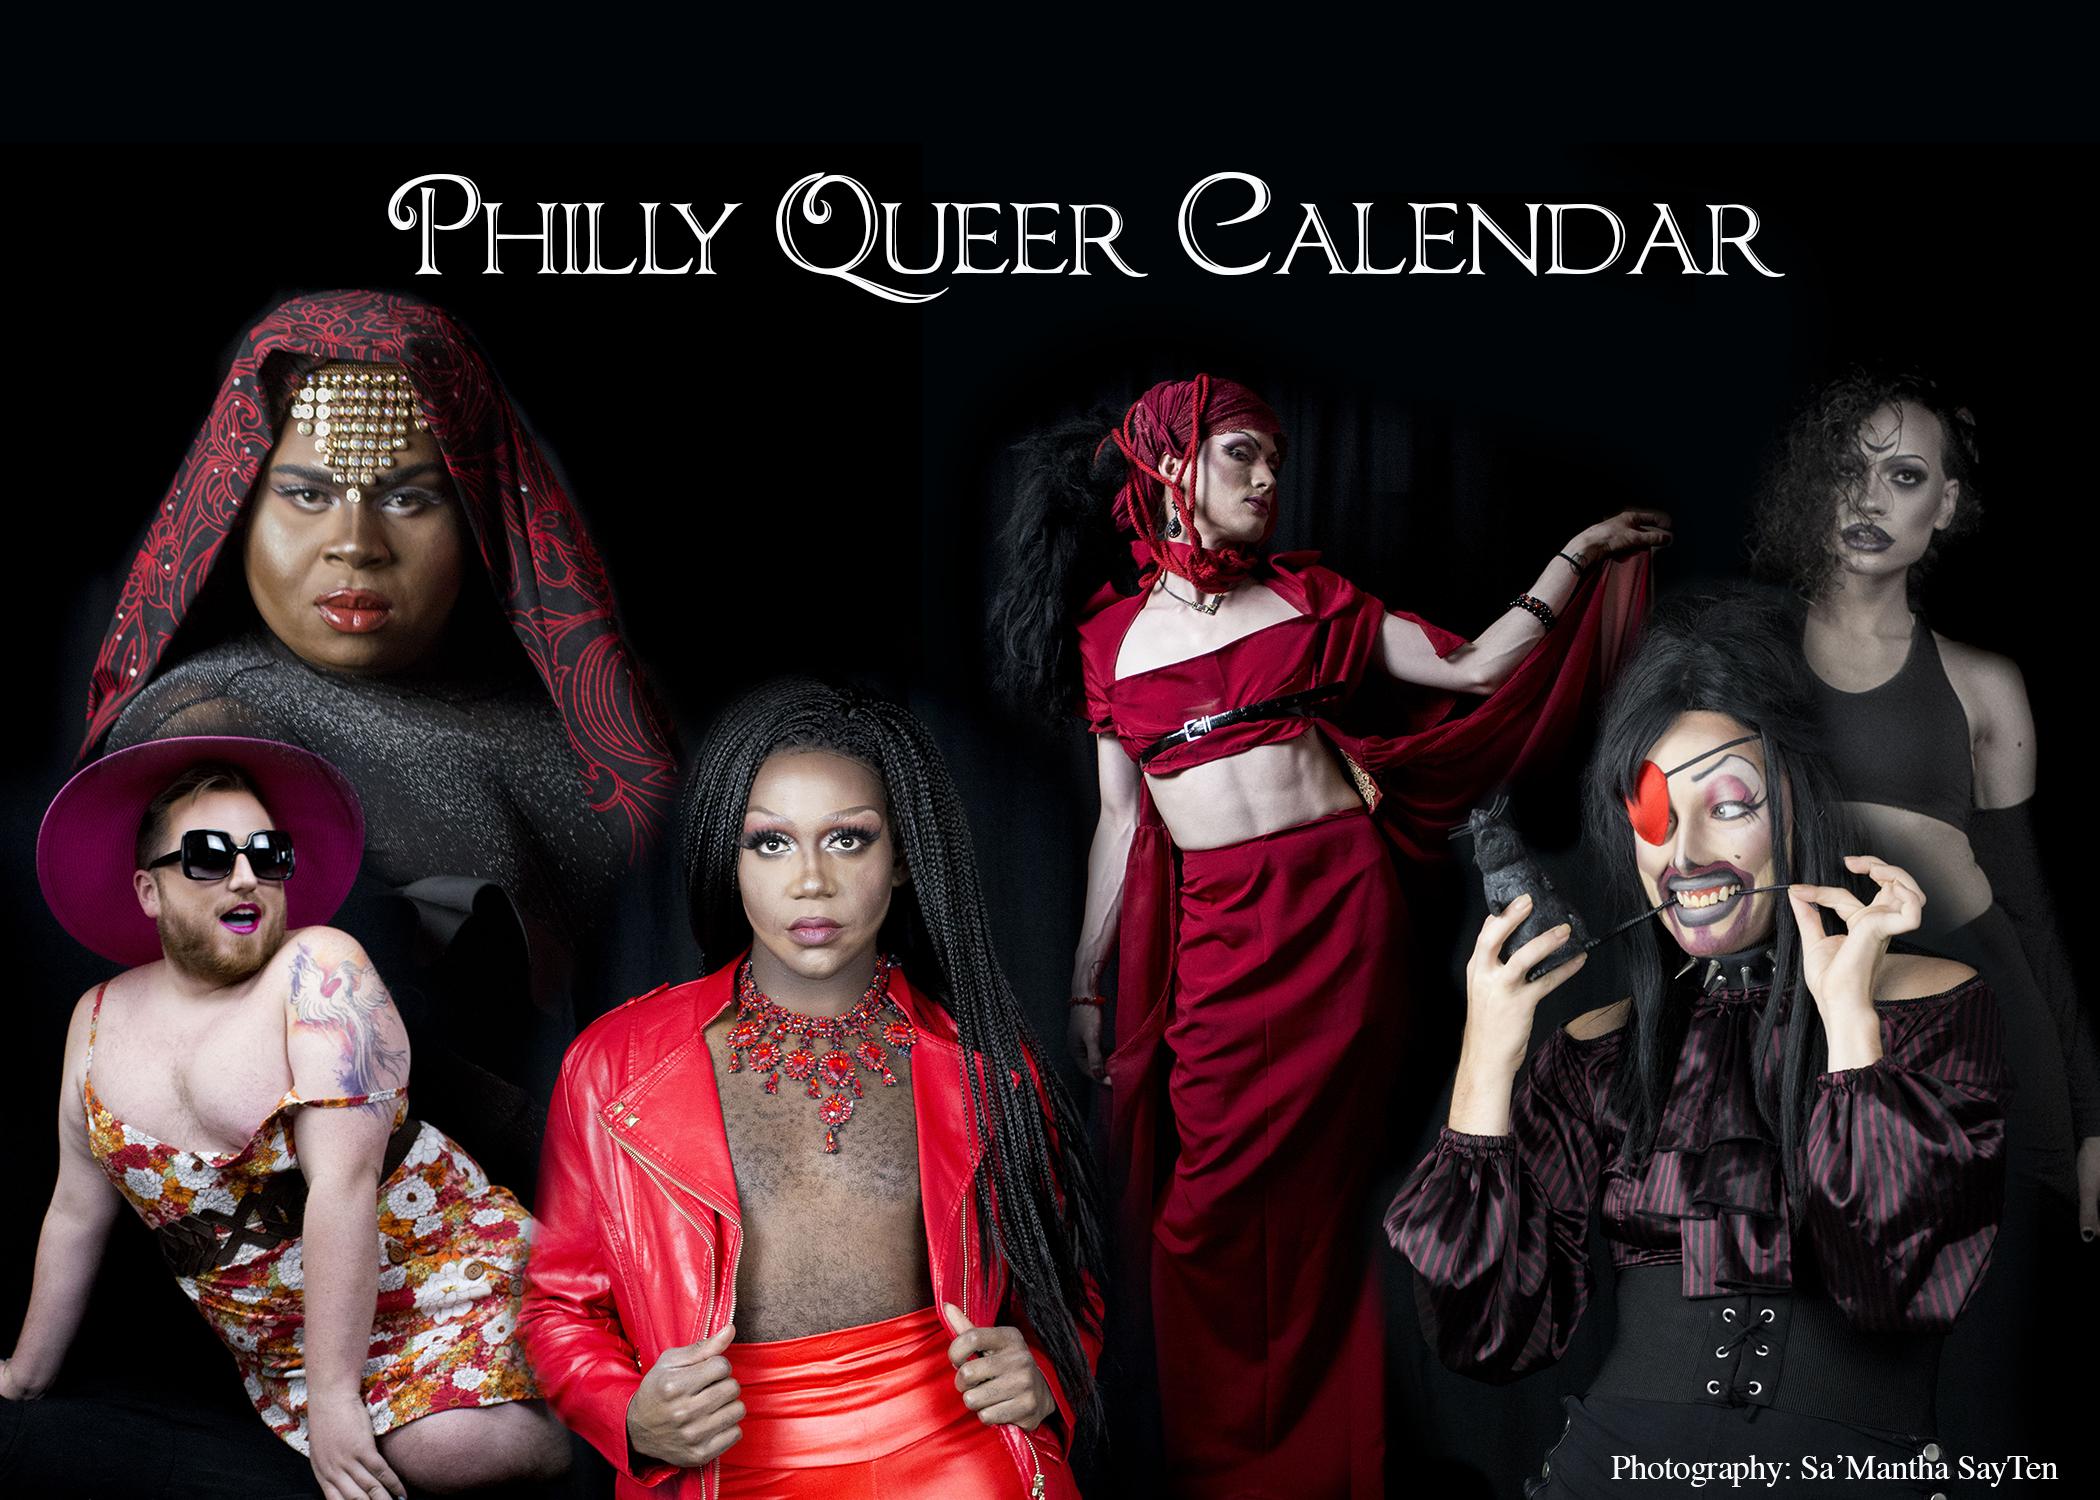 philly queer calendar.jpg